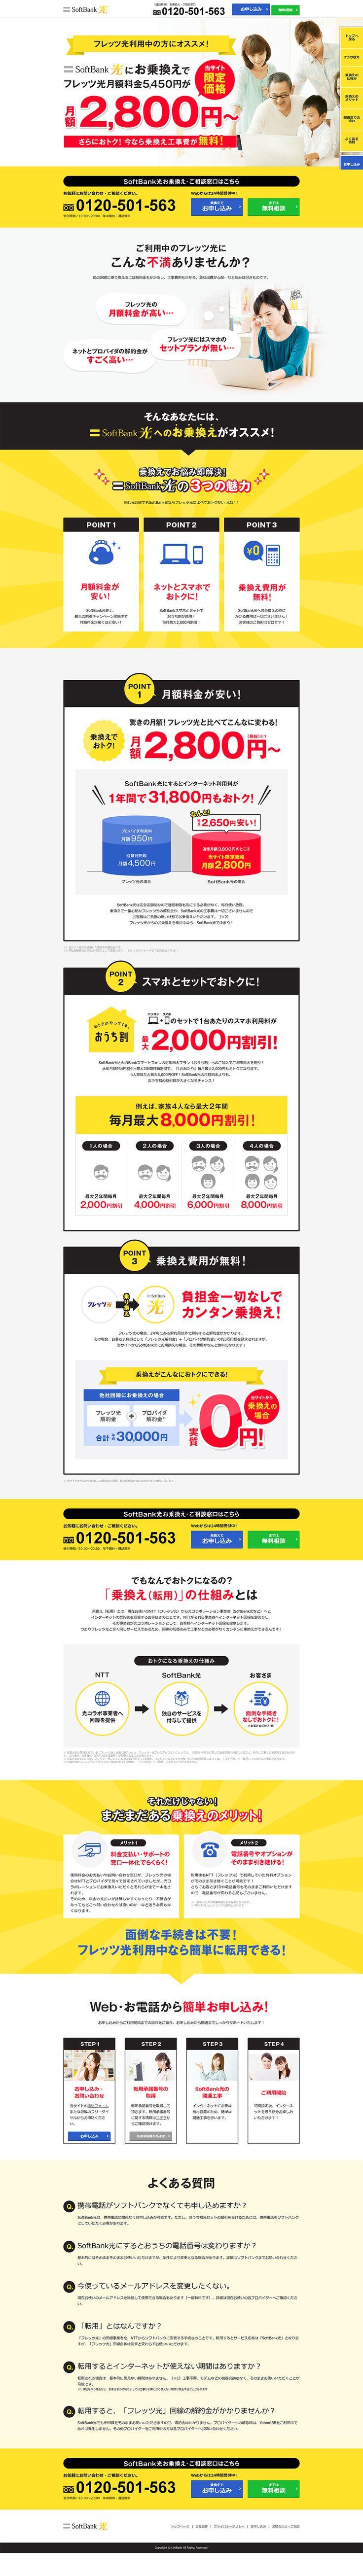 SoftBank 光 (ソフトバンク光) 転用お申込みサイト